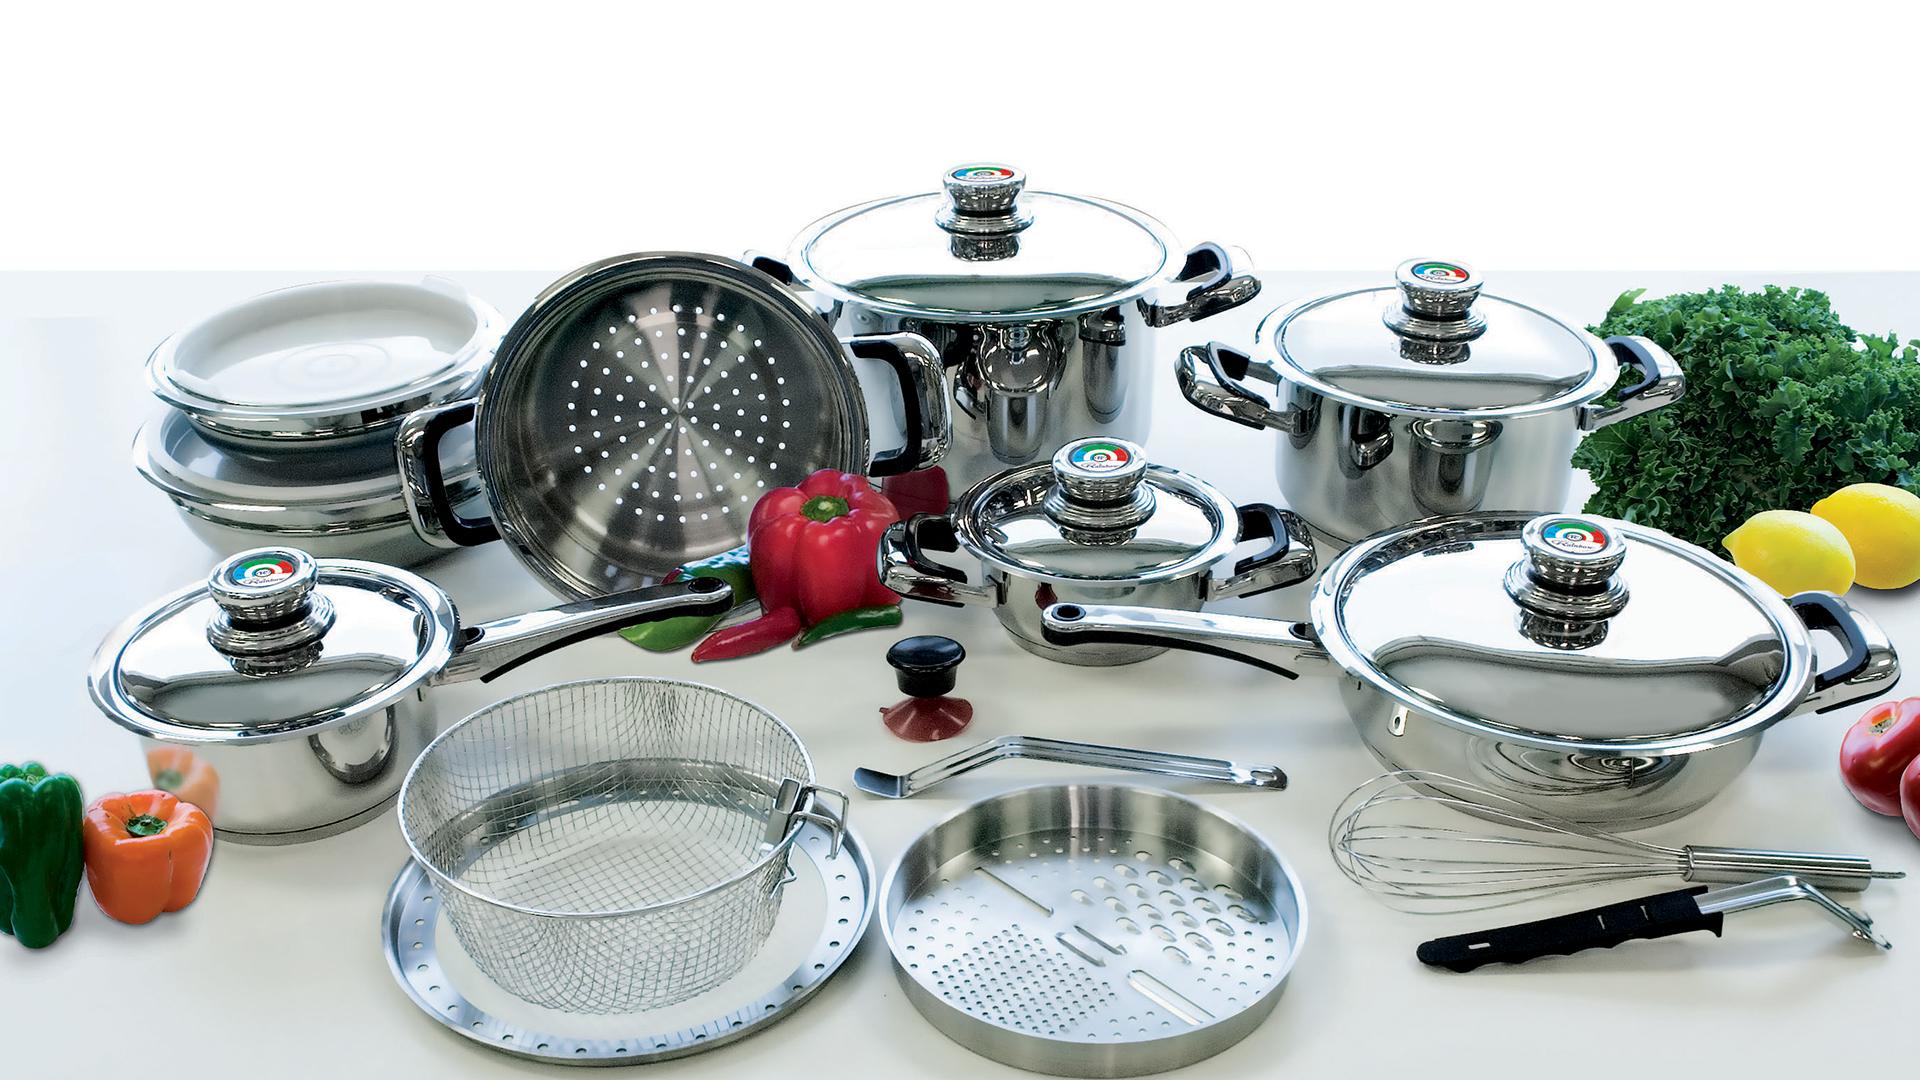 Rainbow Cooking System - Visit WebsiteWarranty Info